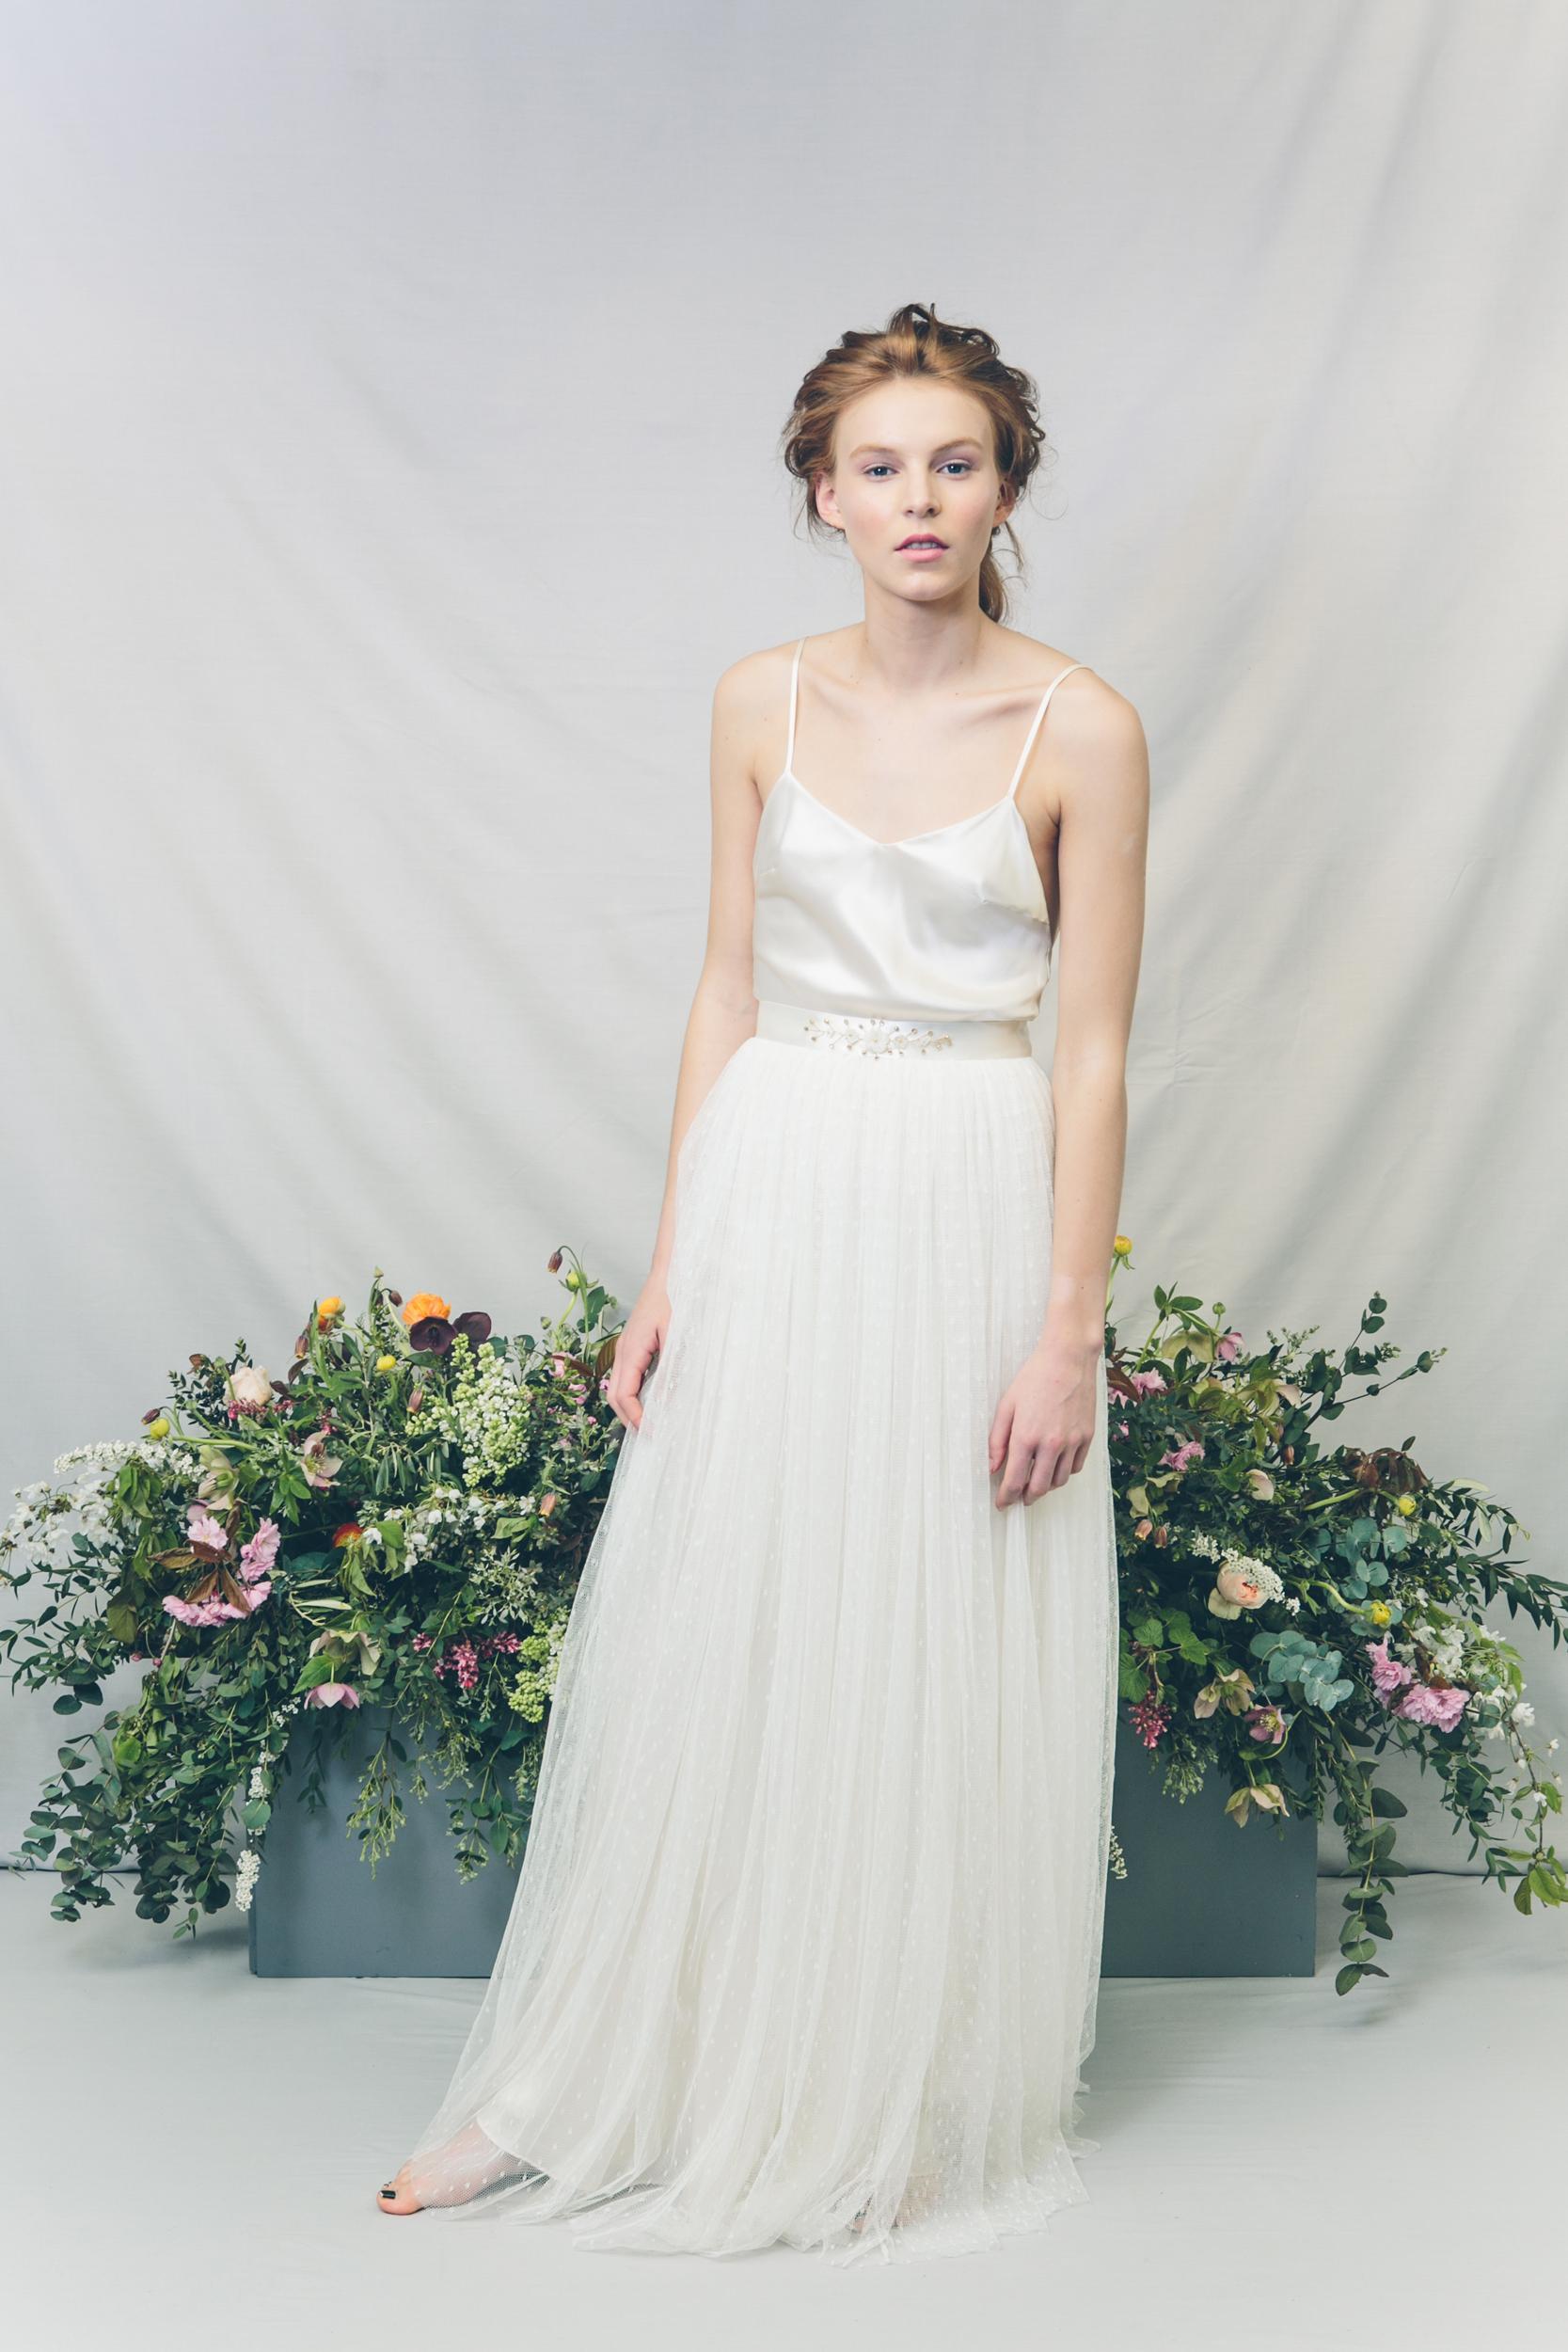 Kate-Beaumont-Wedding-Dresses-Sheffield-53.jpg